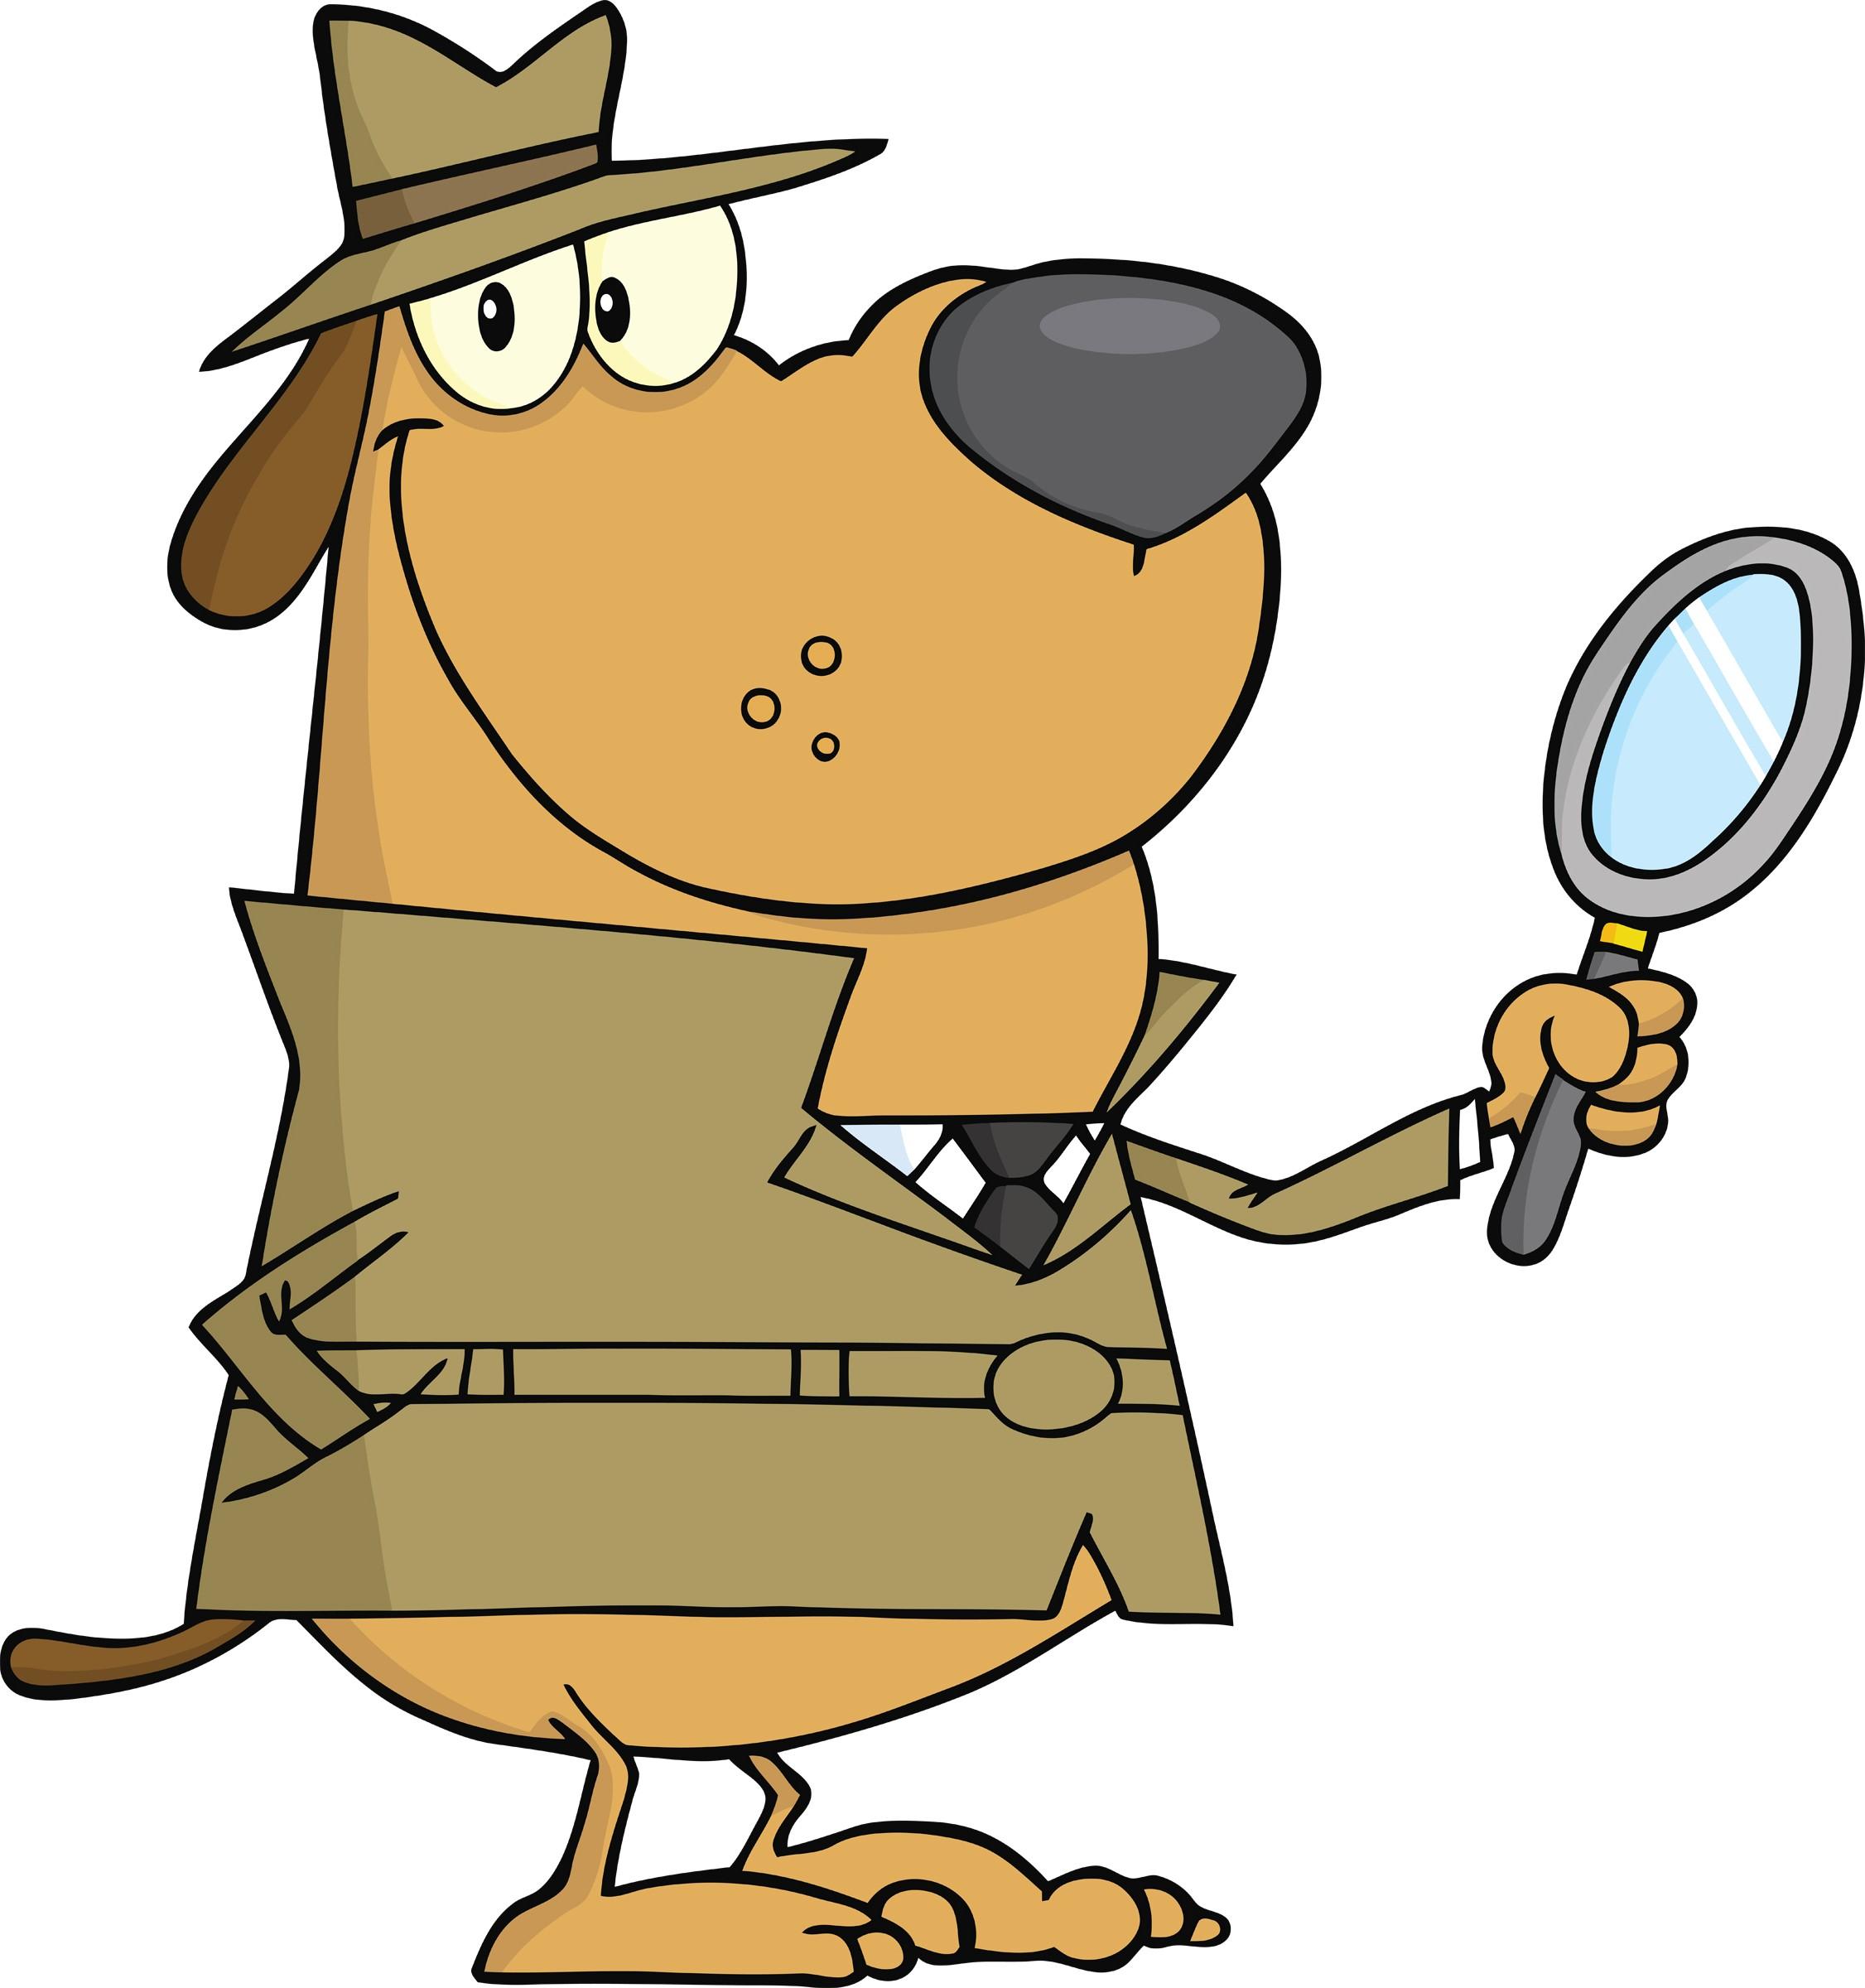 Kid detective clipart clip black and white download Free Detectives Cliparts, Download Free Clip Art, Free Clip Art on ... clip black and white download